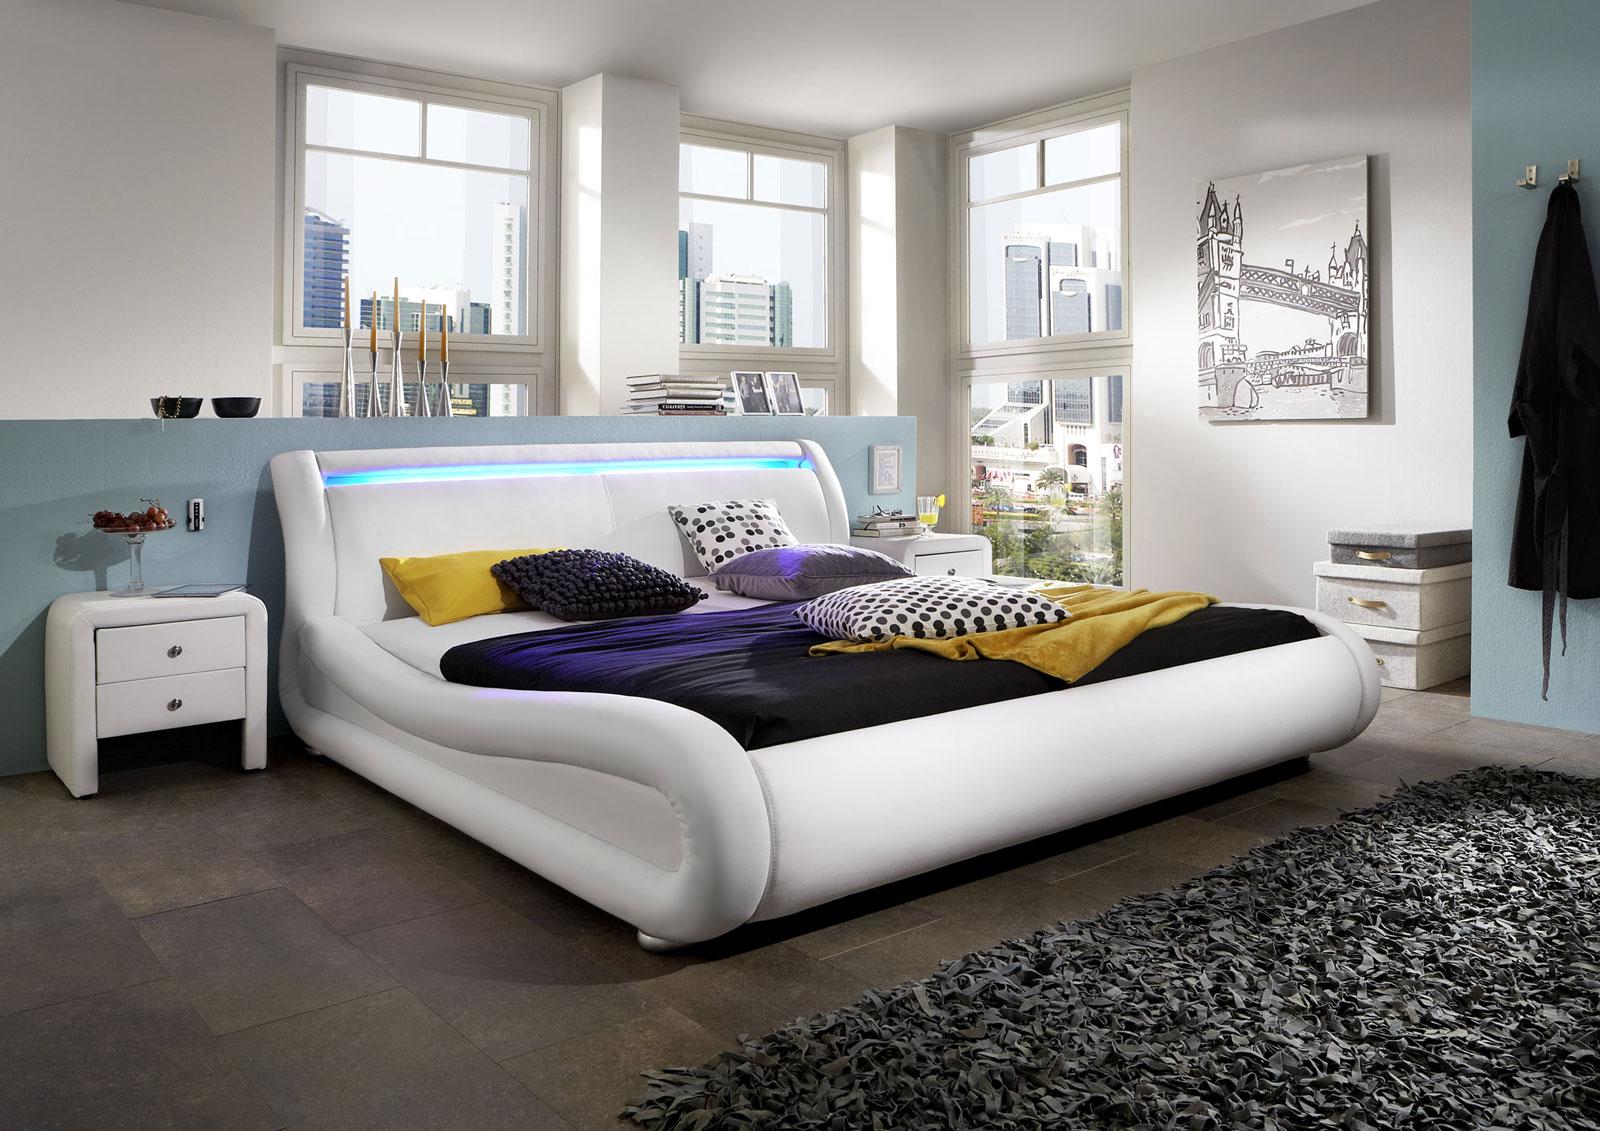 Full Size of Polsterbett 200x220 200 220 Cm Wei Clip Led Gnstig Betten Bett Wohnzimmer Polsterbett 200x220